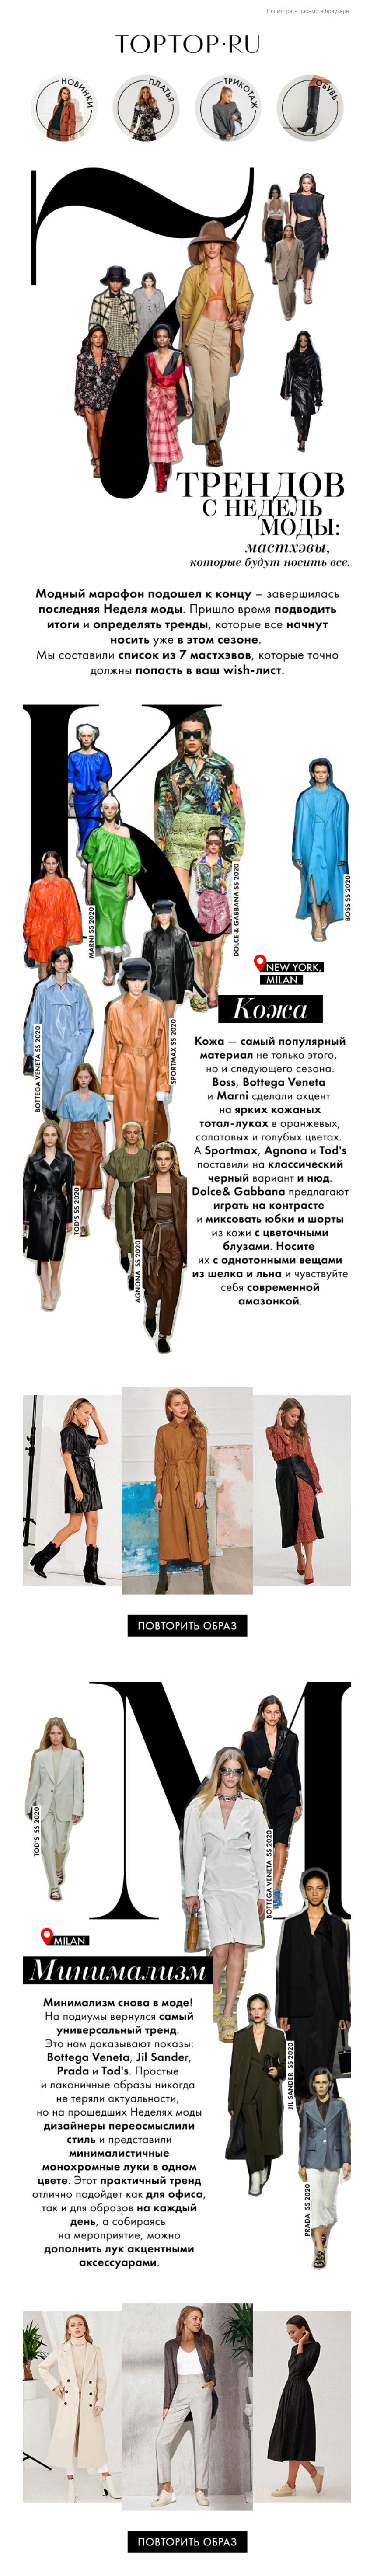 Shoppable контент в письме от Toptop.tu